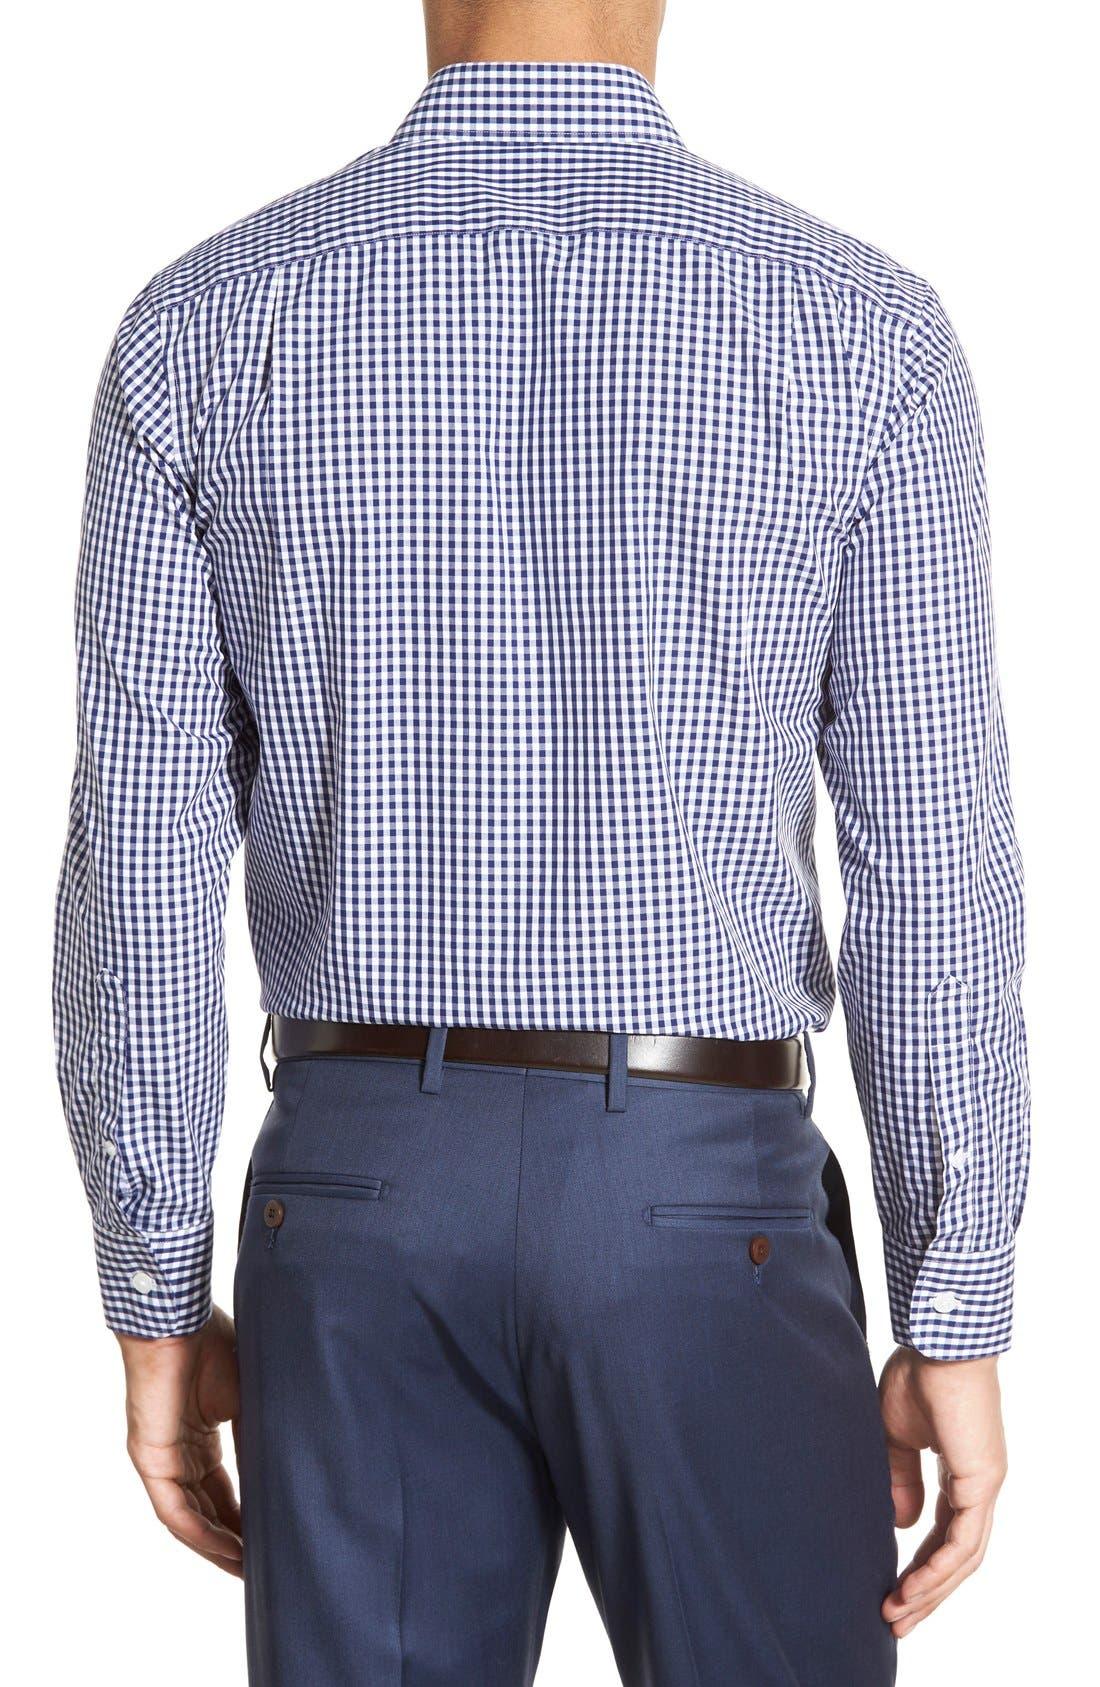 Slim Fit Wrinkle Free Check Dress Shirt,                             Alternate thumbnail 3, color,                             NAVY